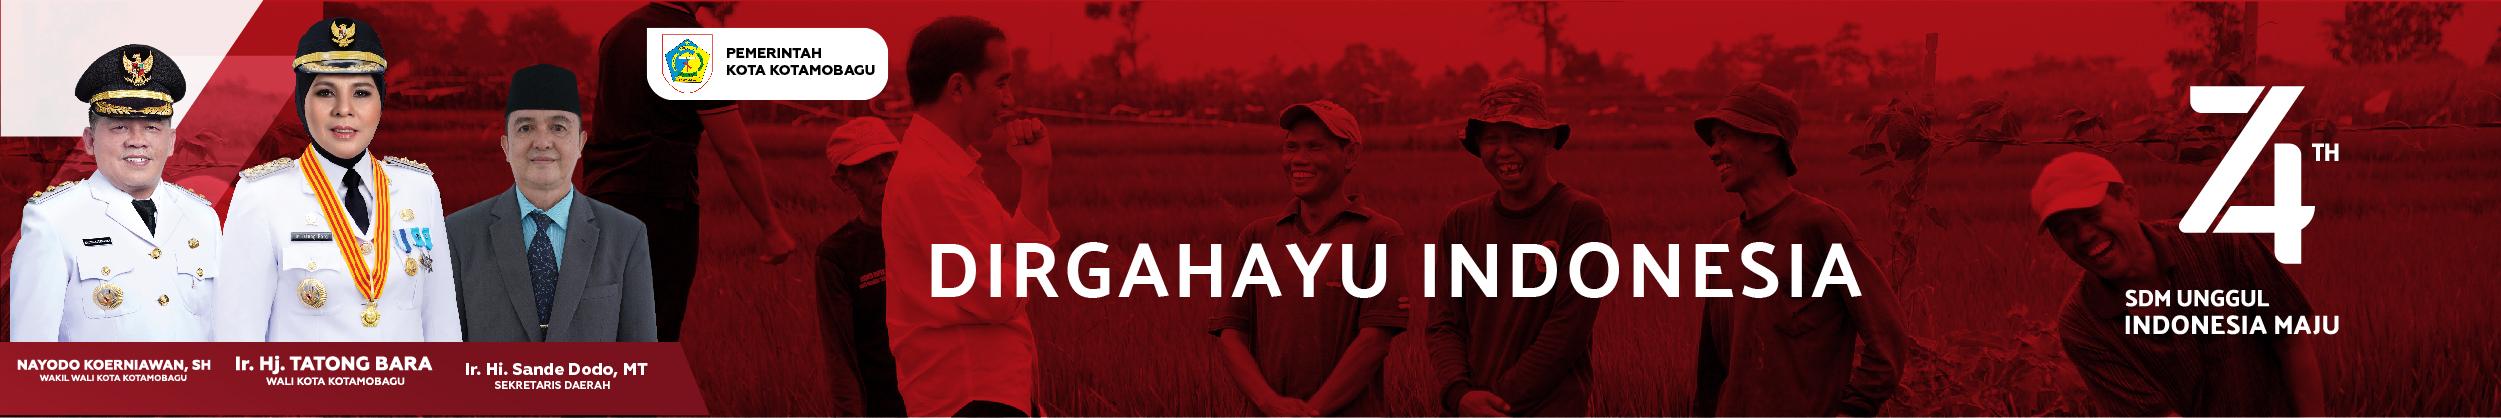 iklan DIRGAHAYU INDONESIA